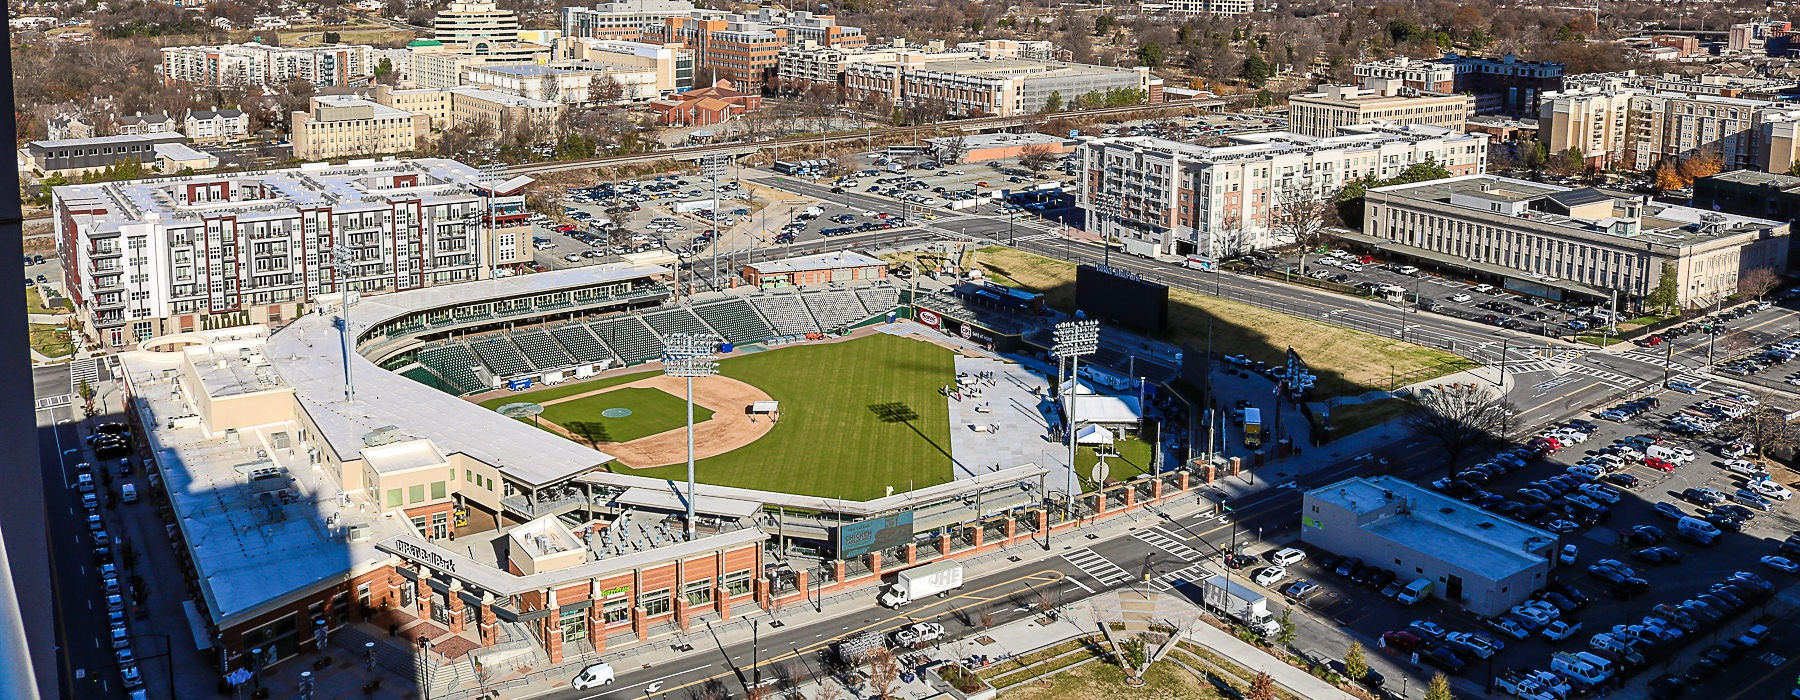 downtown views of Charlotte, NC and baseball stadium